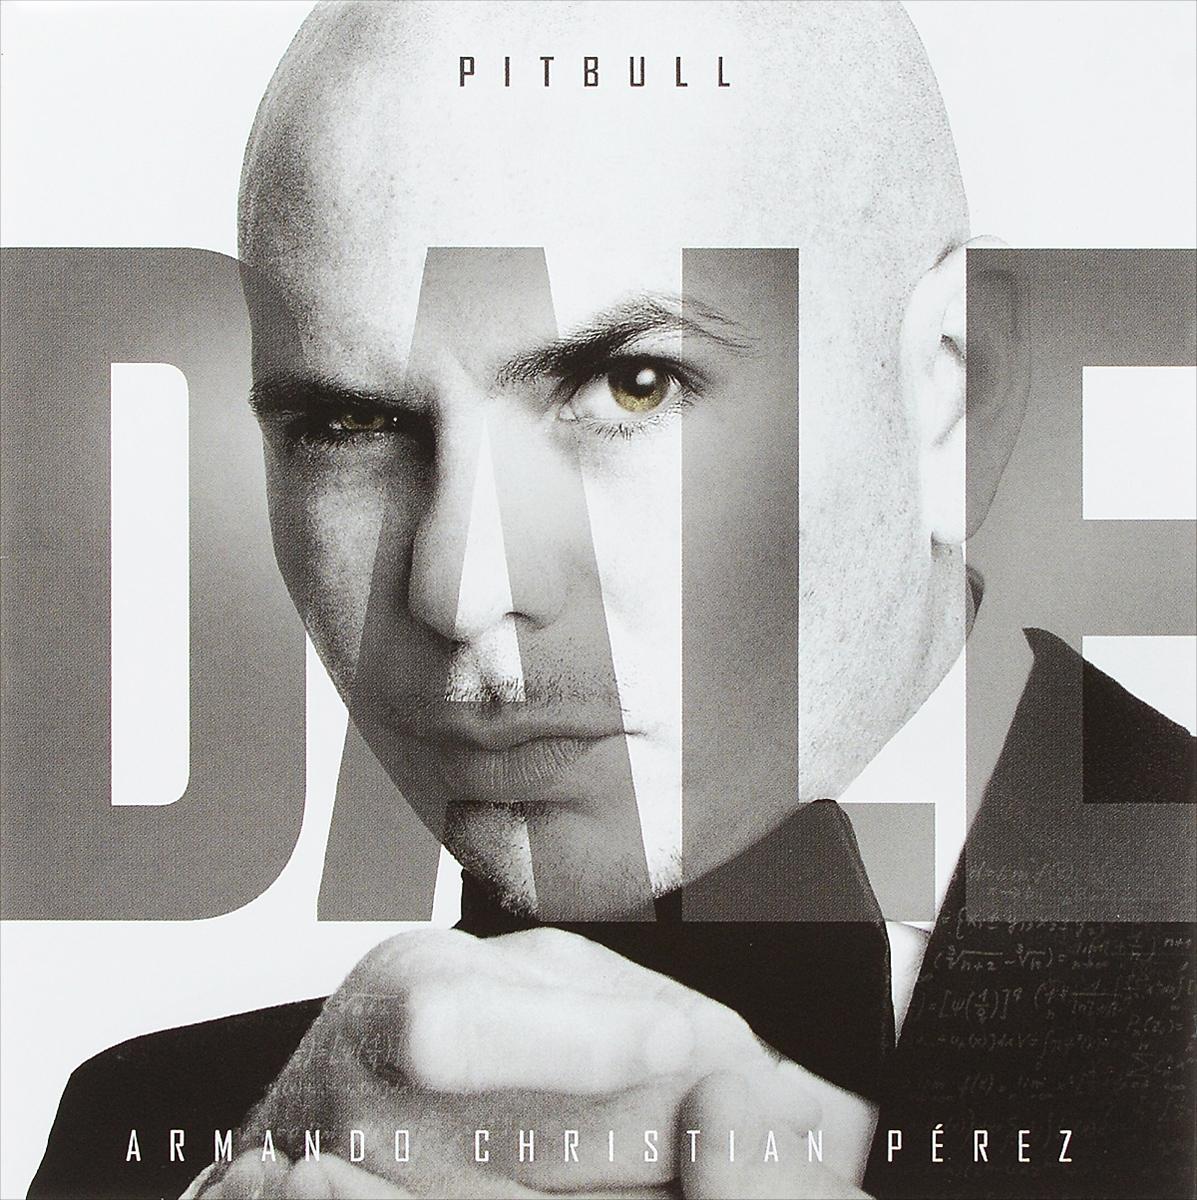 Pitbull Pitbull. Dale pitbull pitbull rebelution